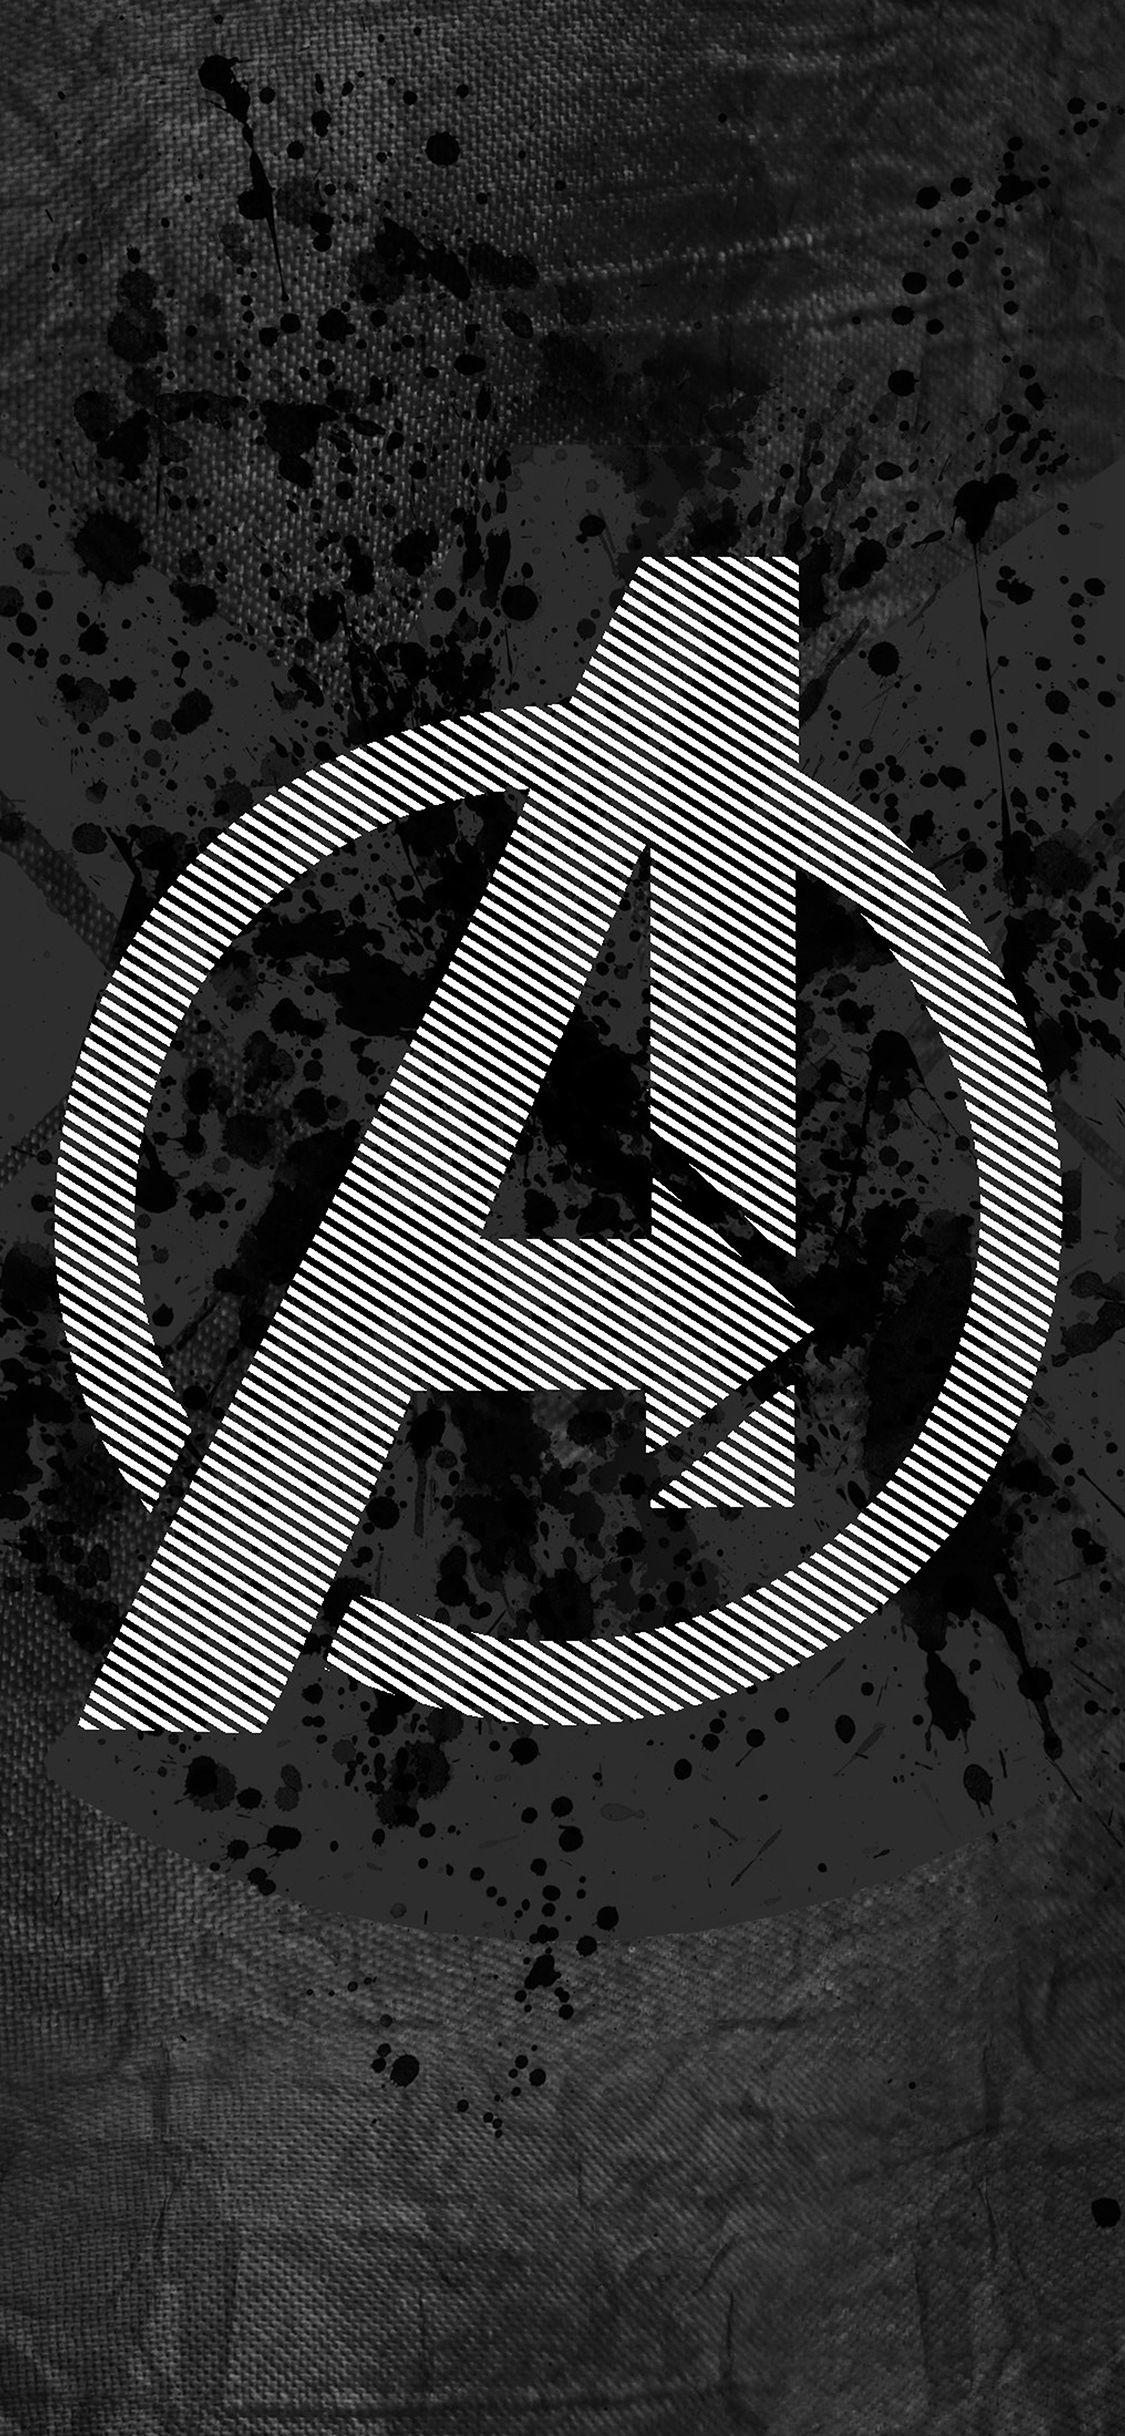 Papers Co Am03 Avengers Logo Art Hero Dark 41 Iphone Wallpaper Jpg 1125 2436 Avengers Logo Logo Wallpaper Hd Avengers Wallpaper